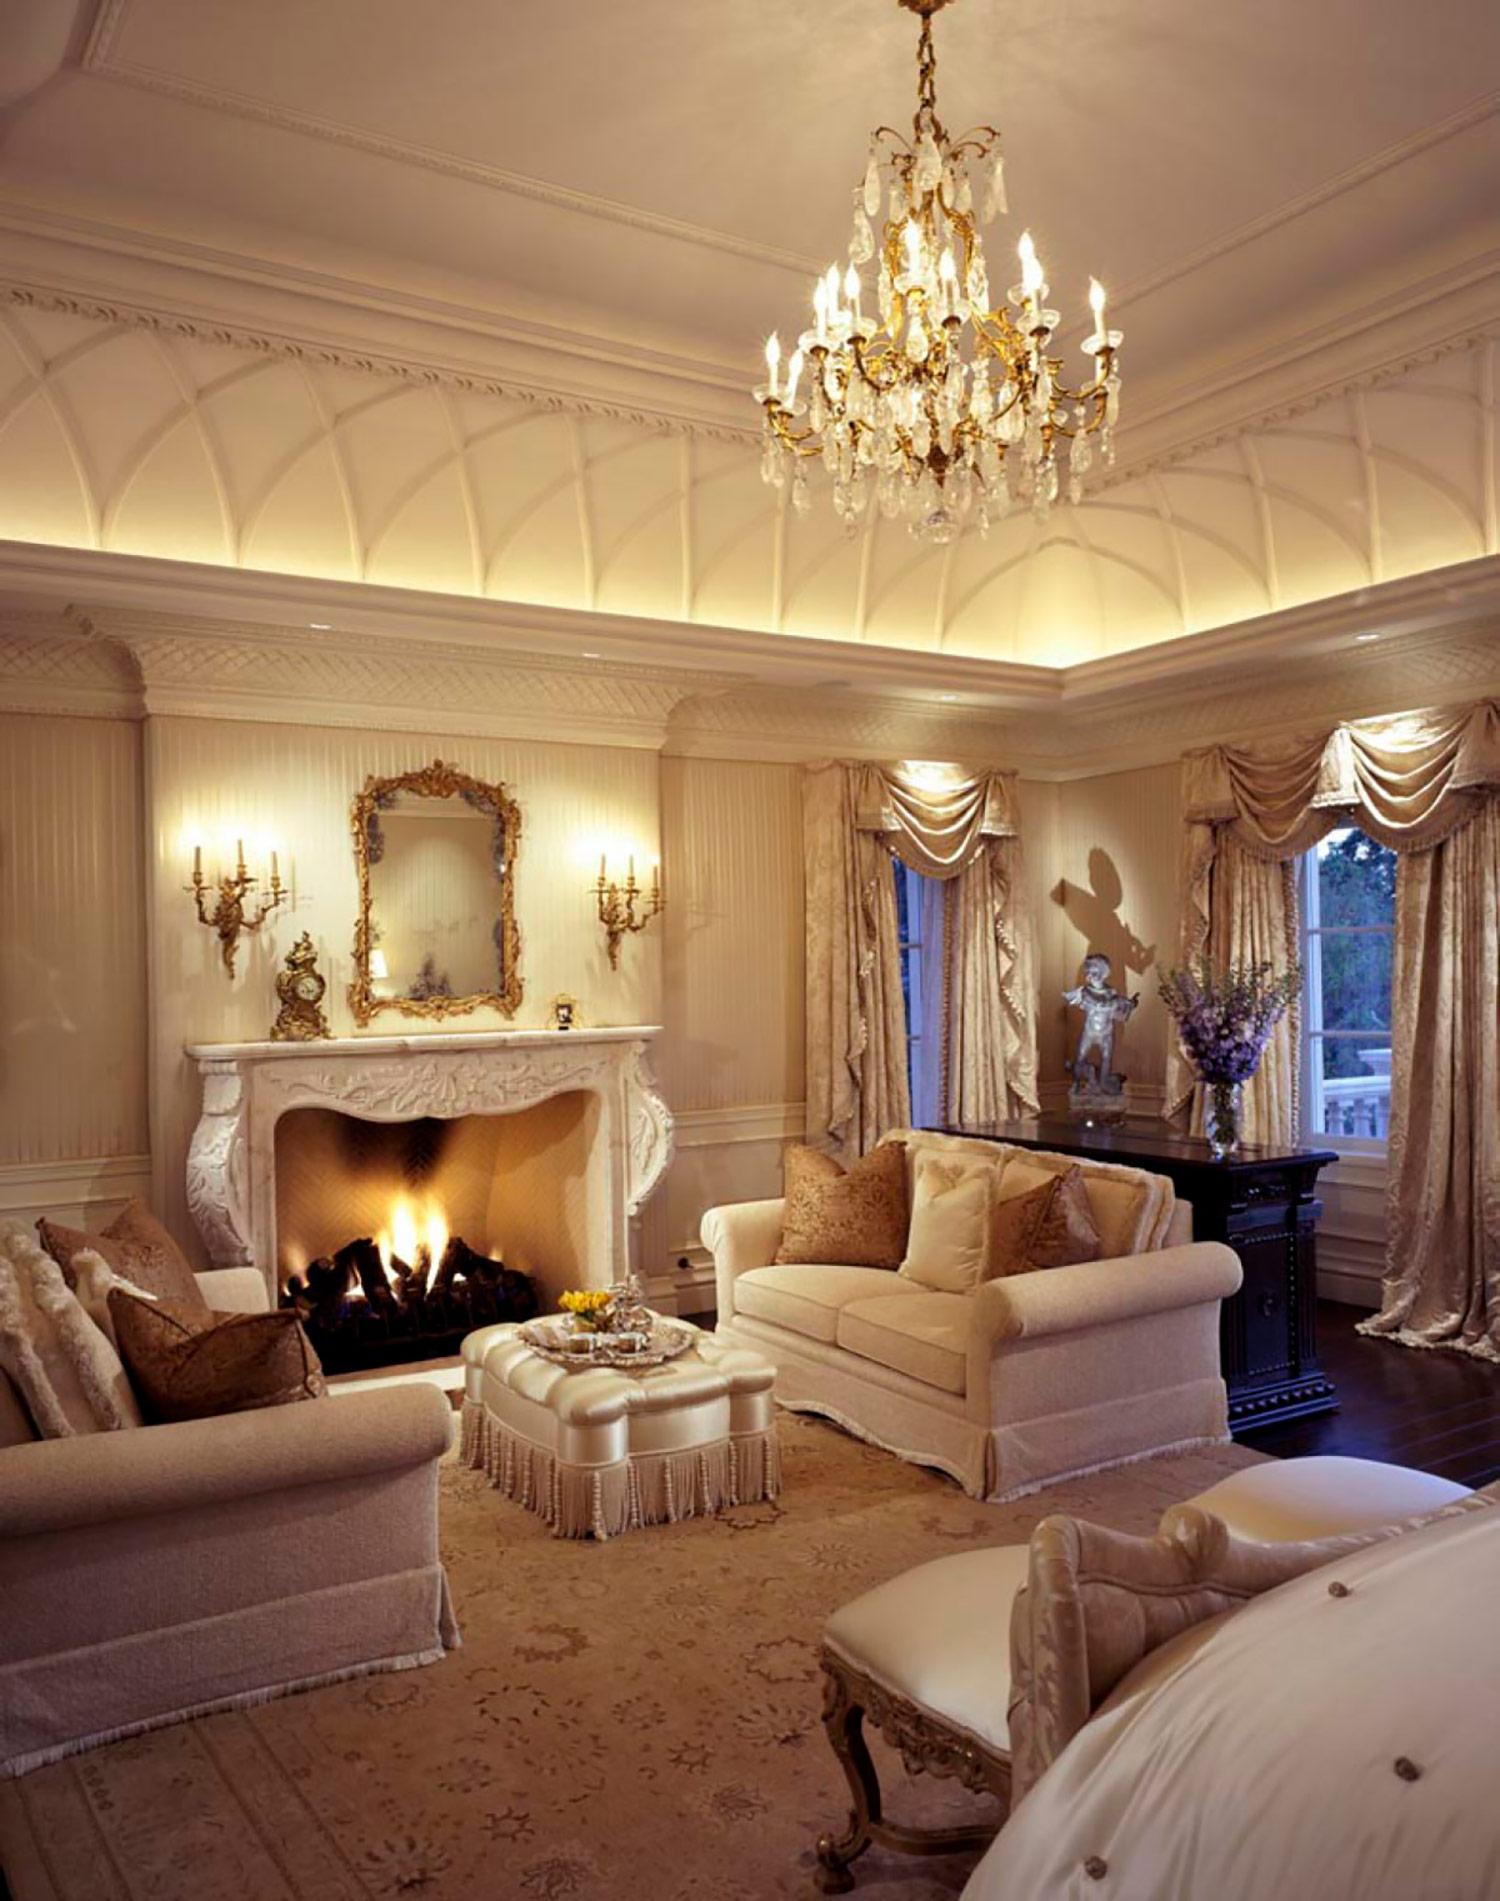 window treatments, upholstery, throw pillows Interior Design: Howard Design Group